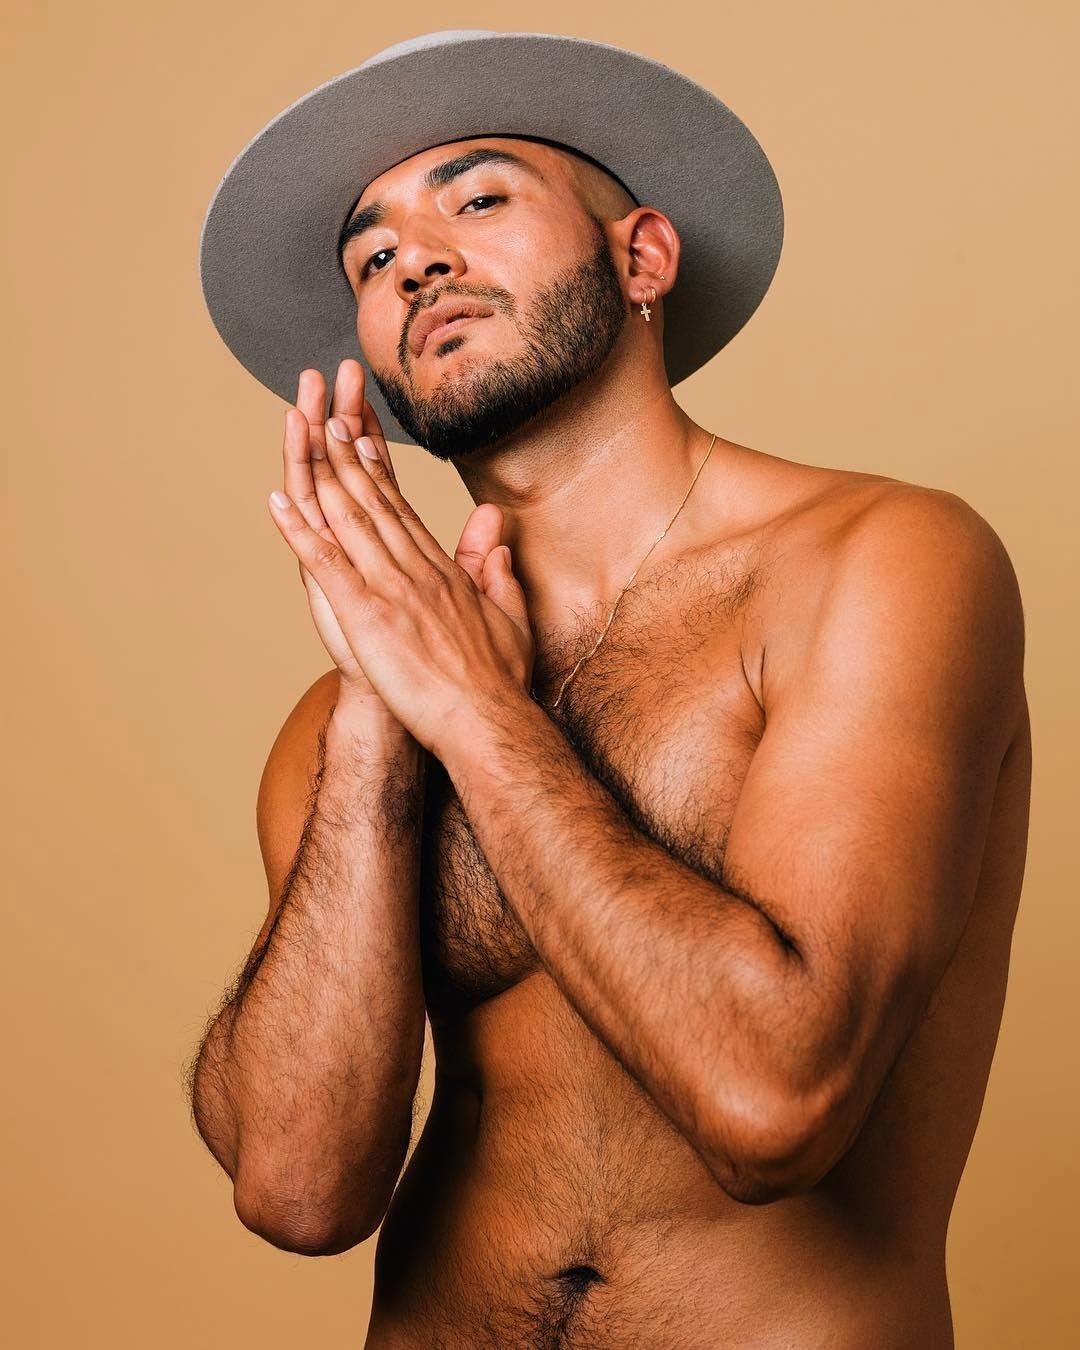 Alejandro AriaS, by Warren Giddarie ft Alejandro AriaS (NSFW).